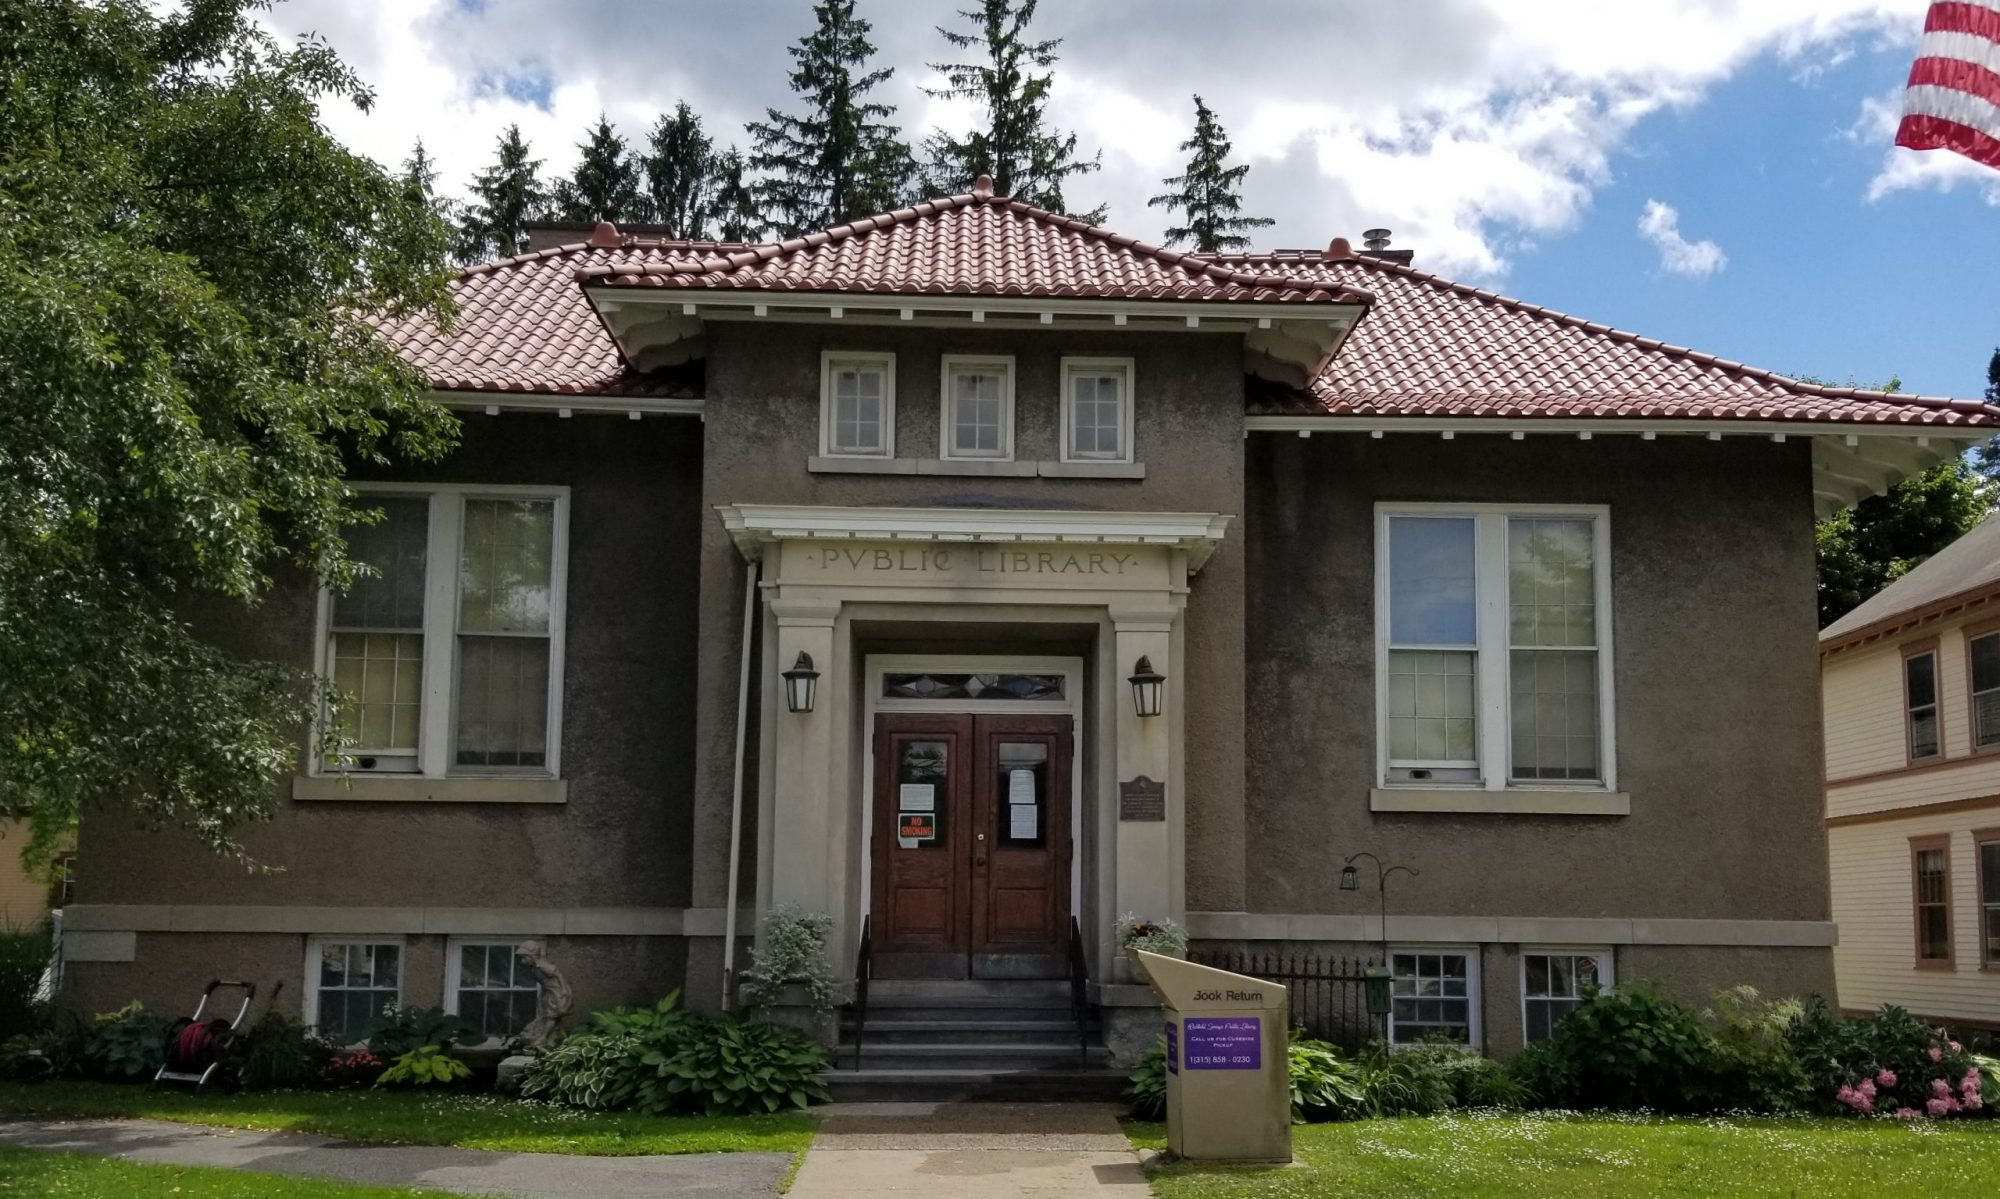 Richfield Springs Public Library